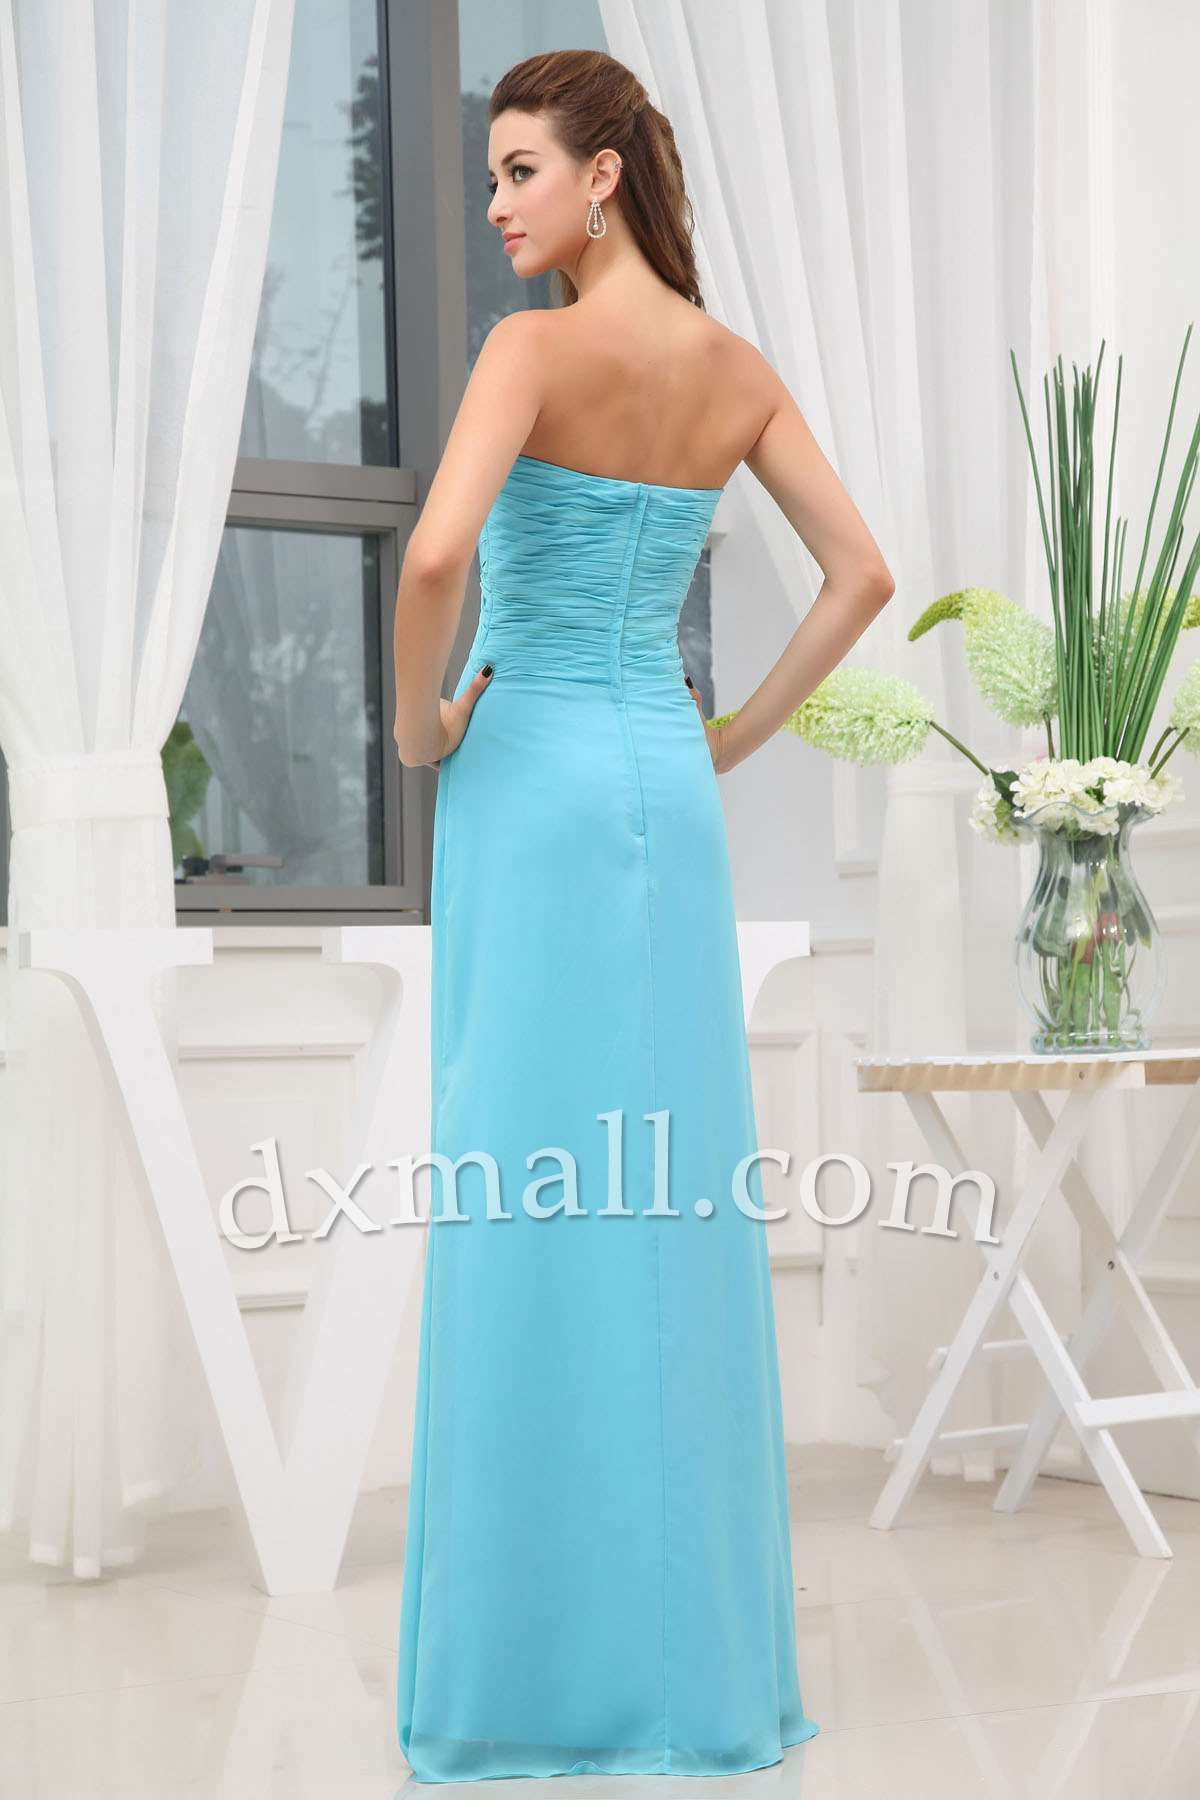 Empire Wedding Guest Dresses Sweetheart Floor Length Chiffon Sky ...